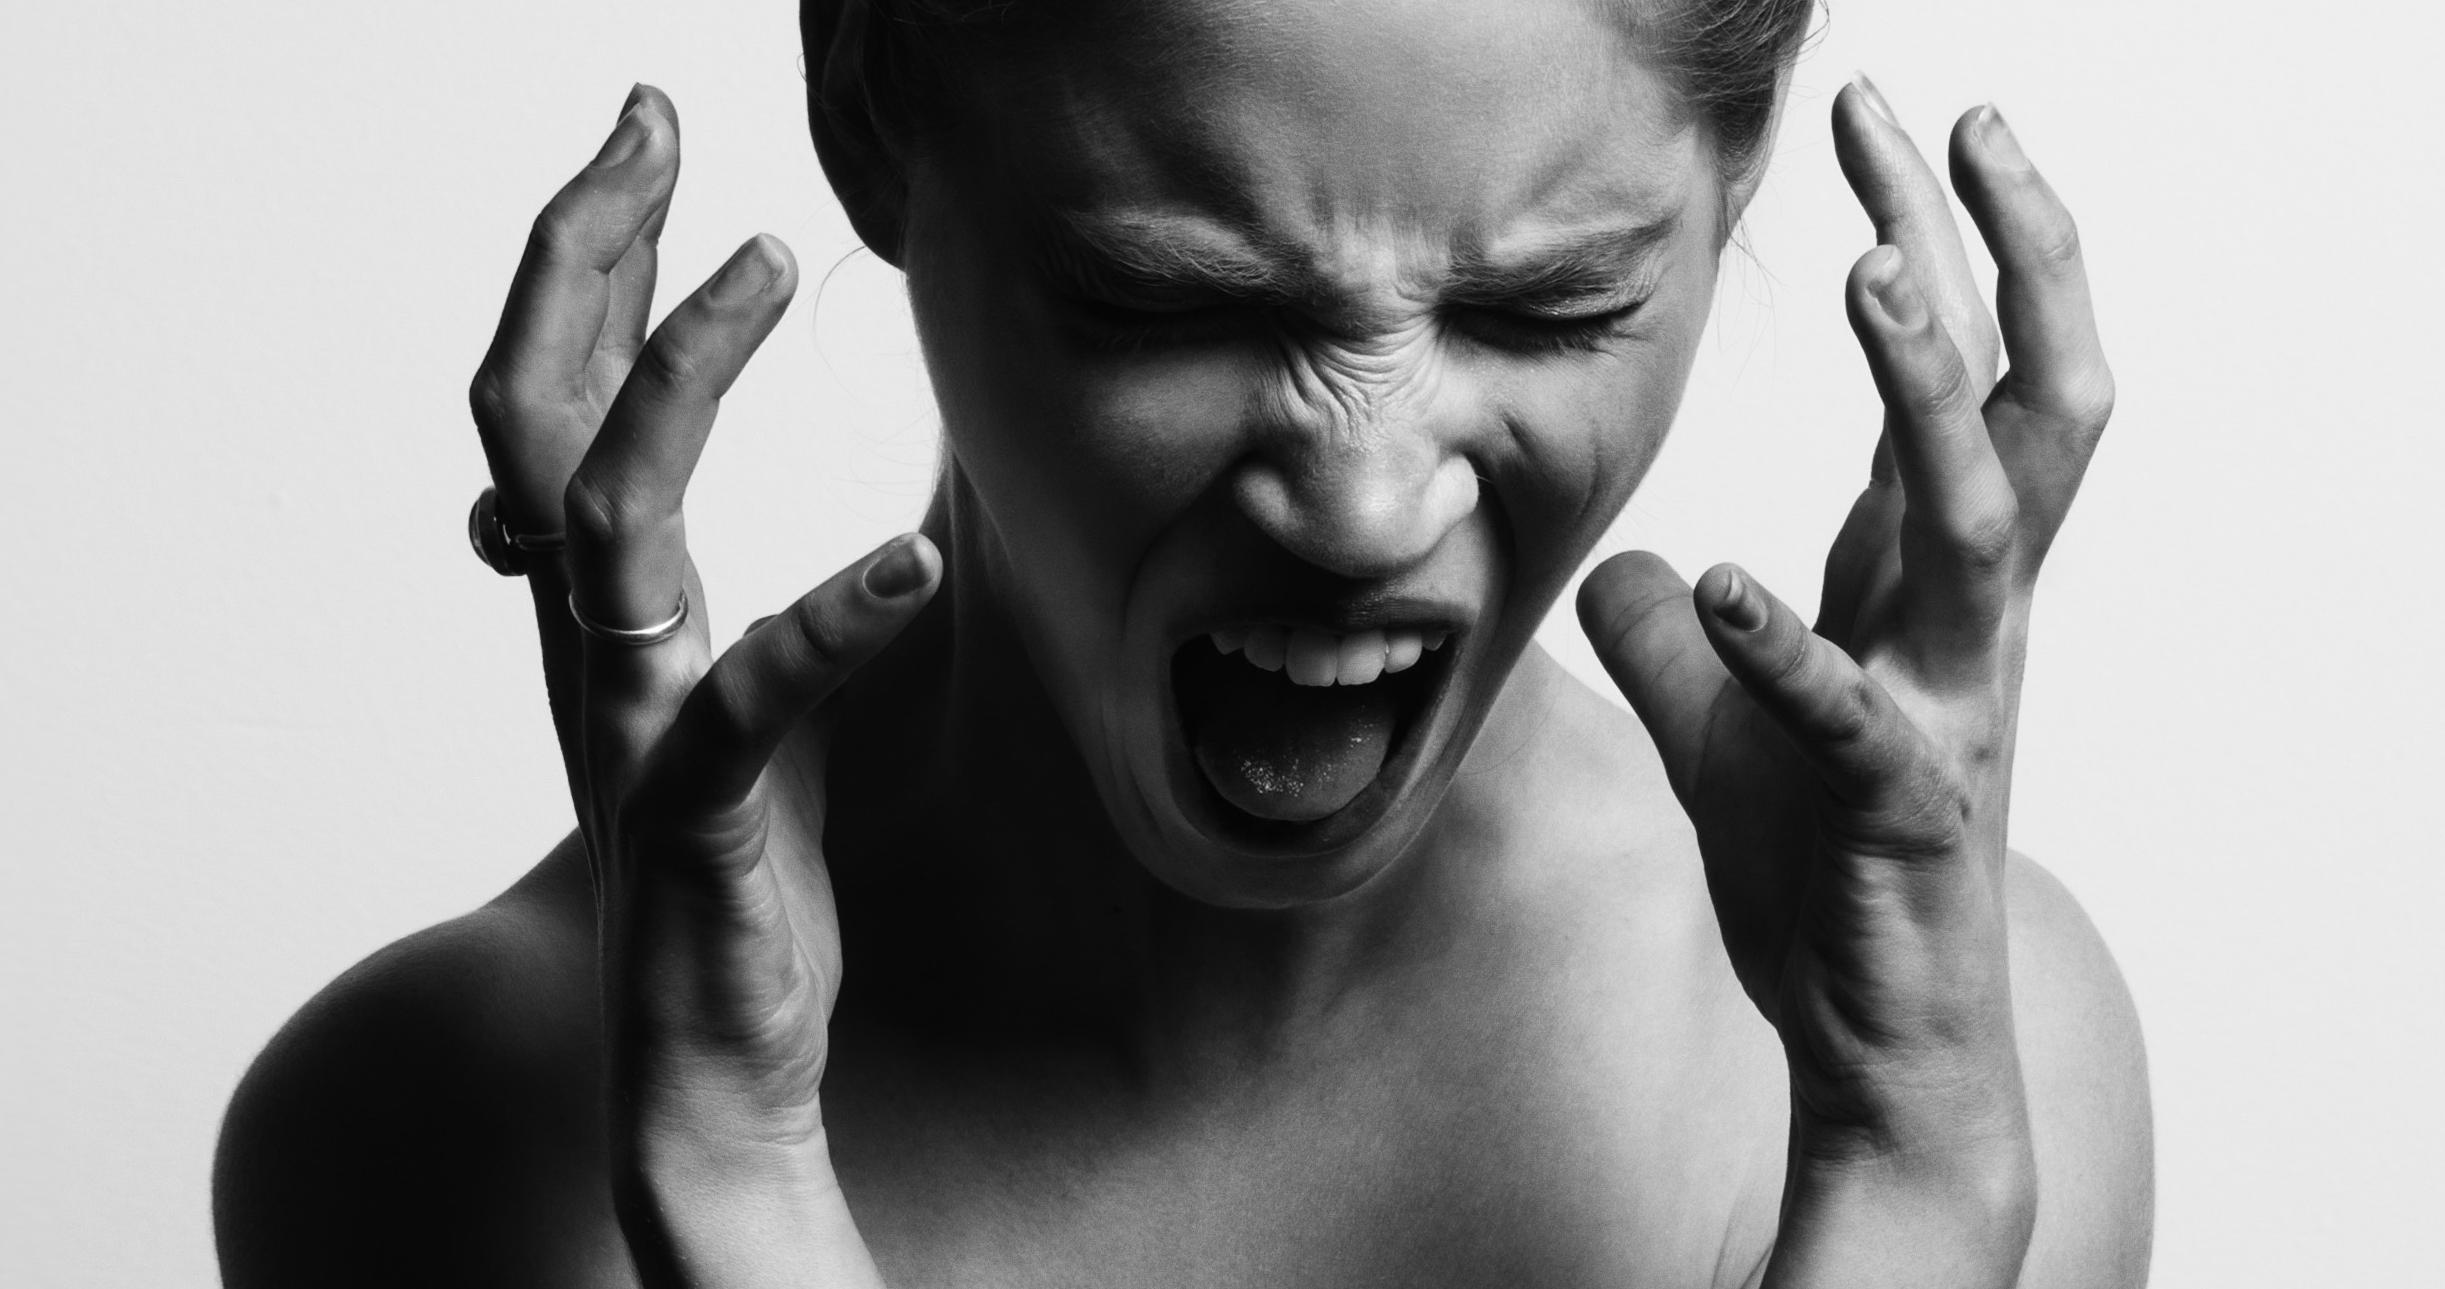 https://www.anidoycheva.com/wp-content/uploads/2018/05/upravlyavame-li-stresa.png